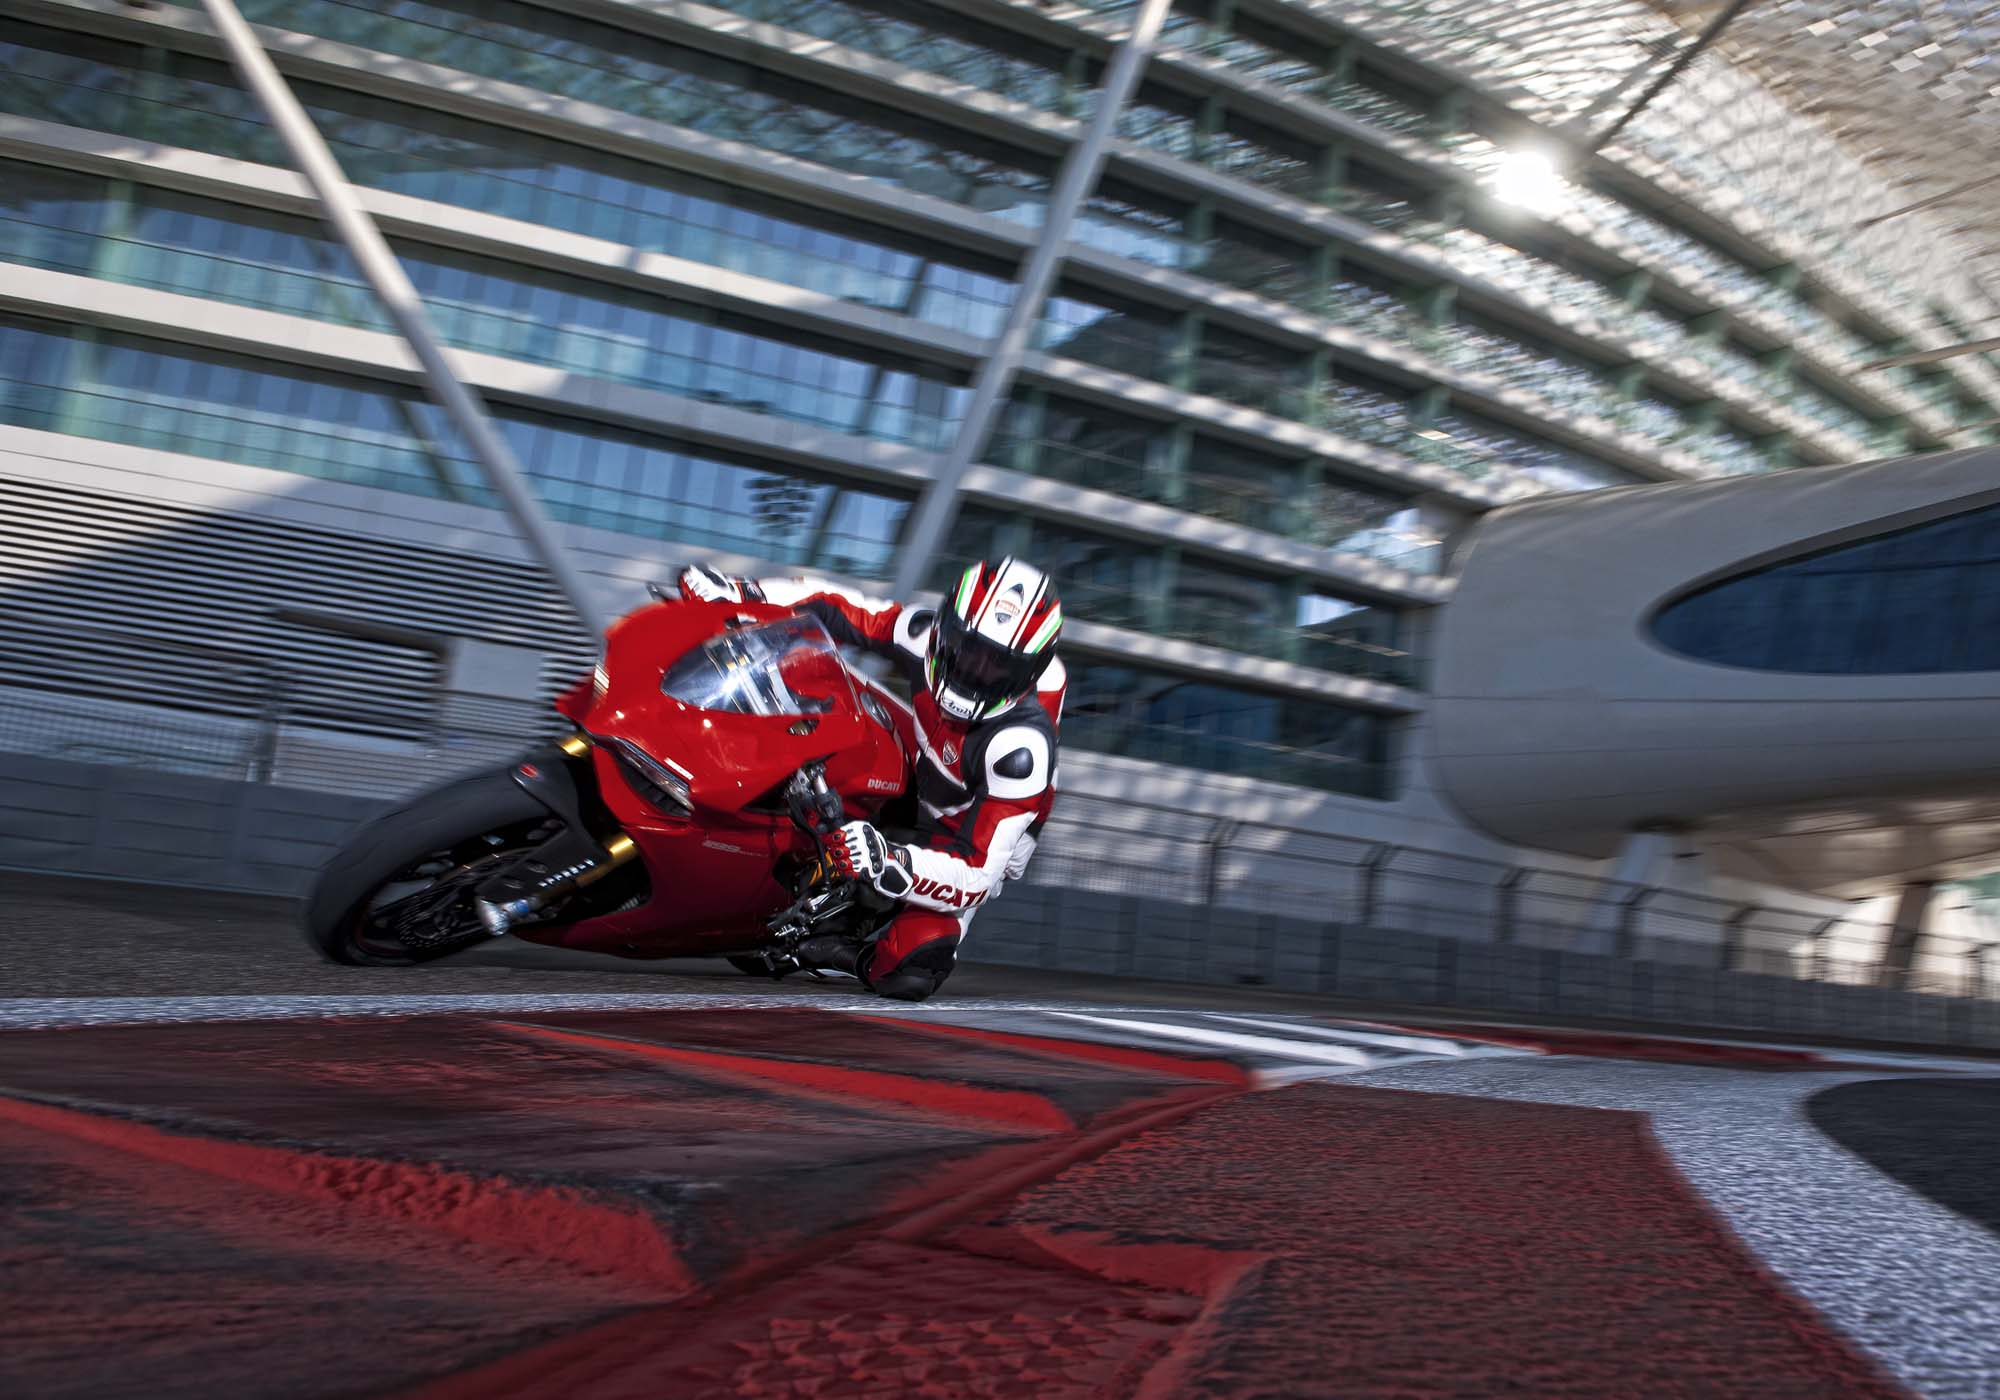 Ducati Panigale Blueprint Ducati 1199 Panigale s 2012